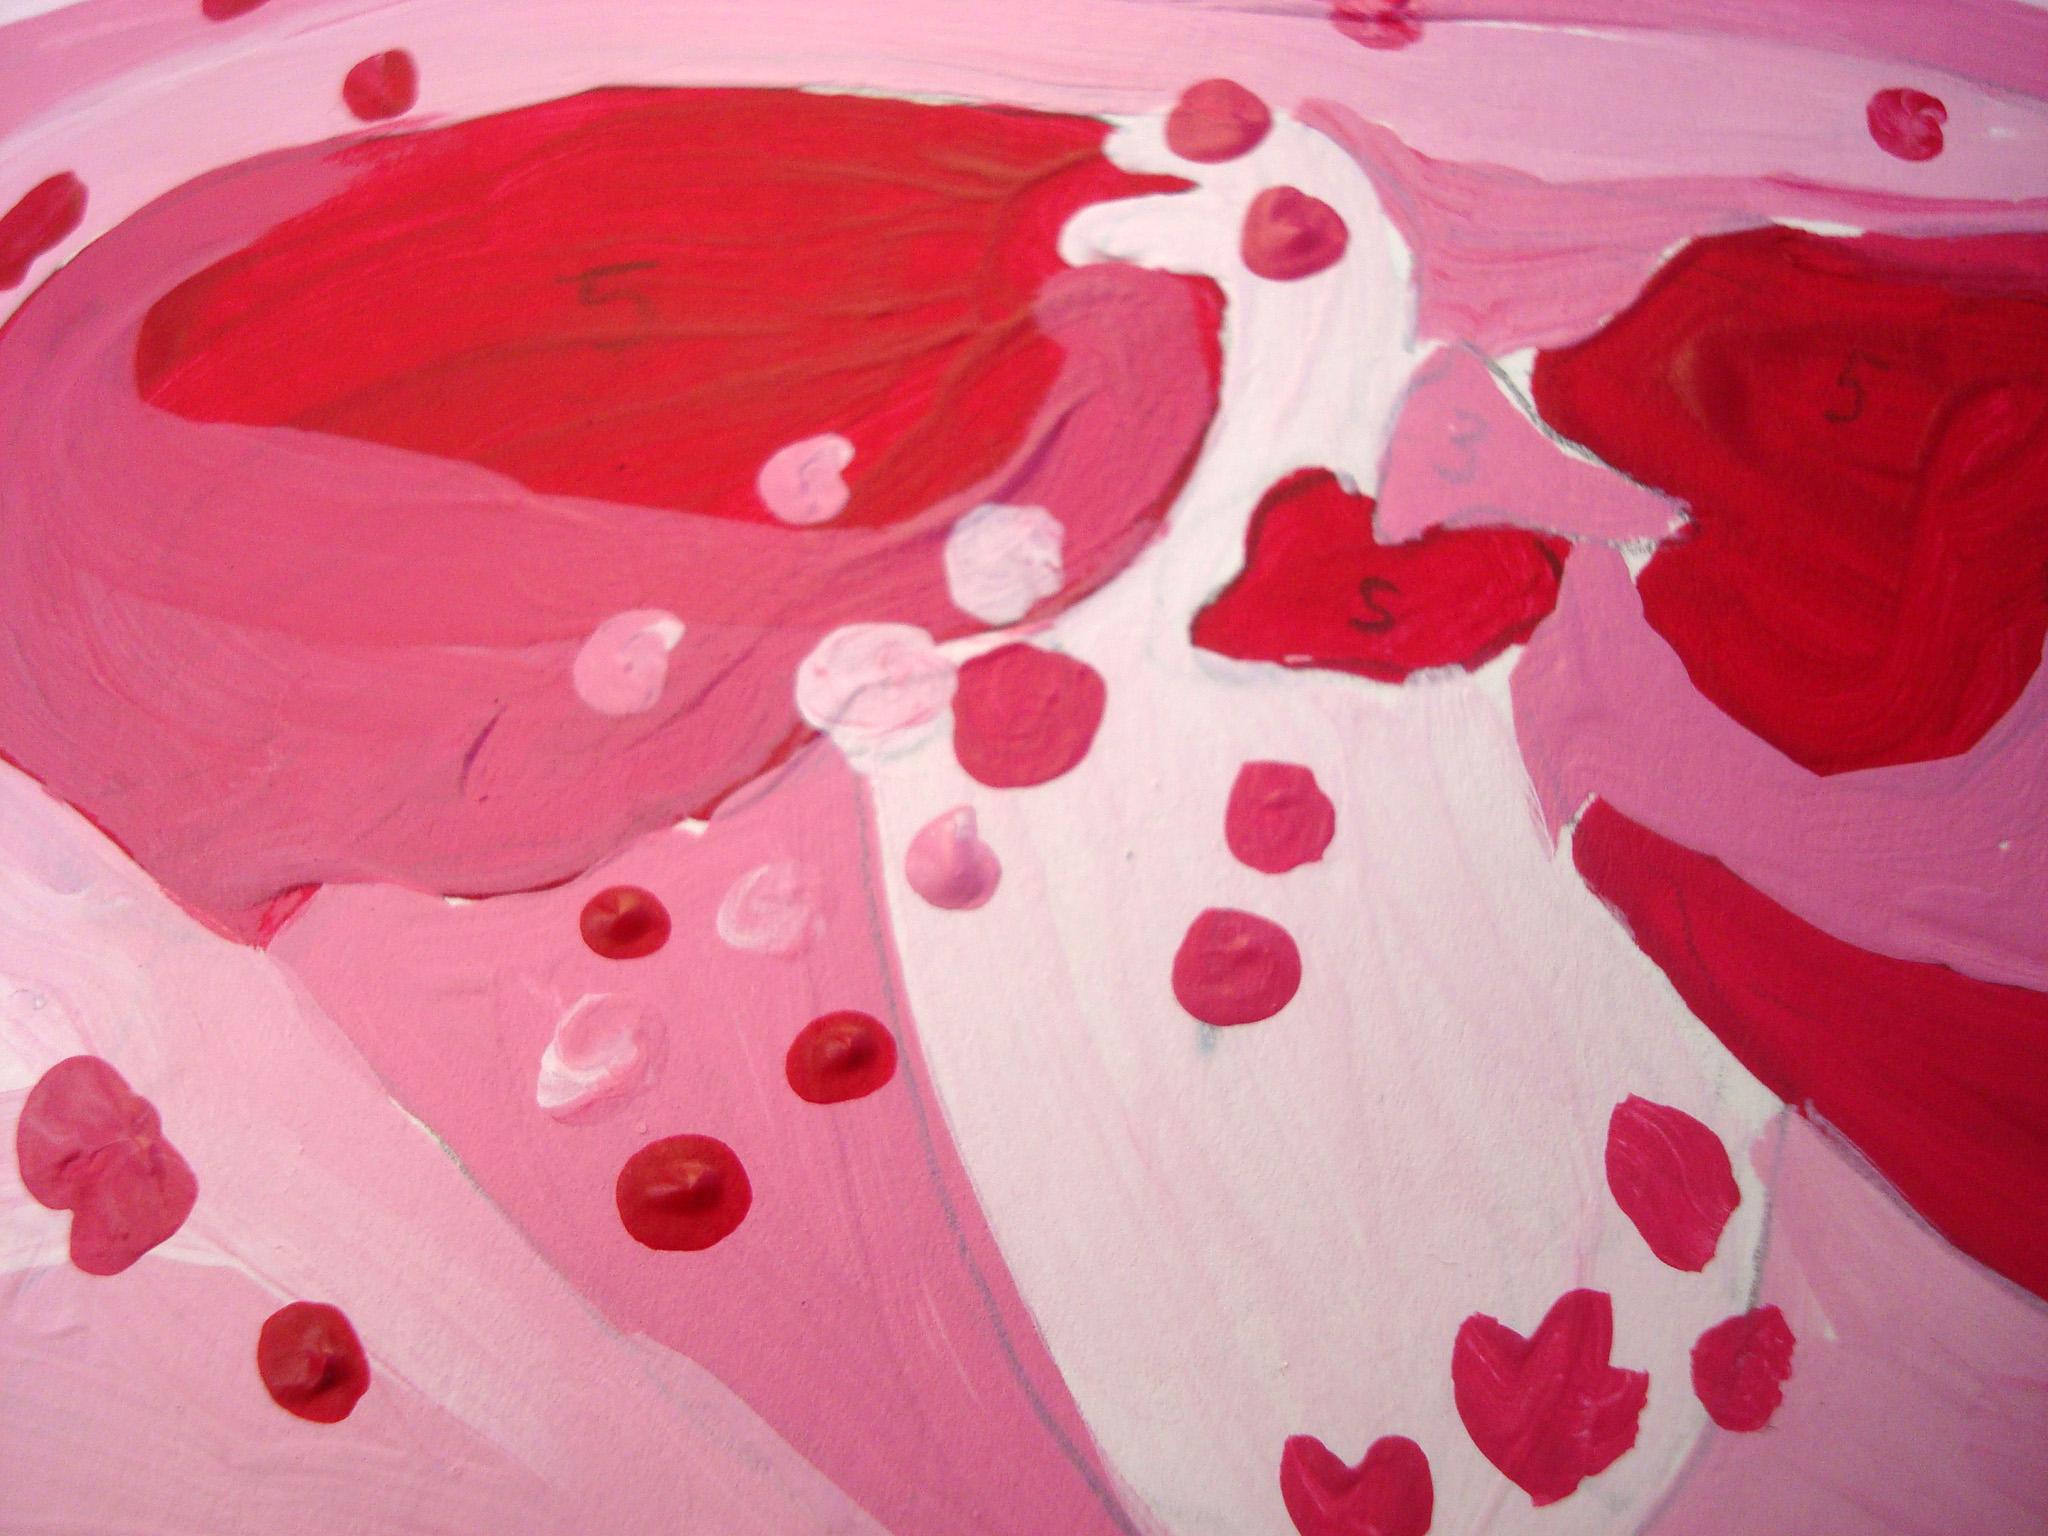 Closeup of monochromatic painting